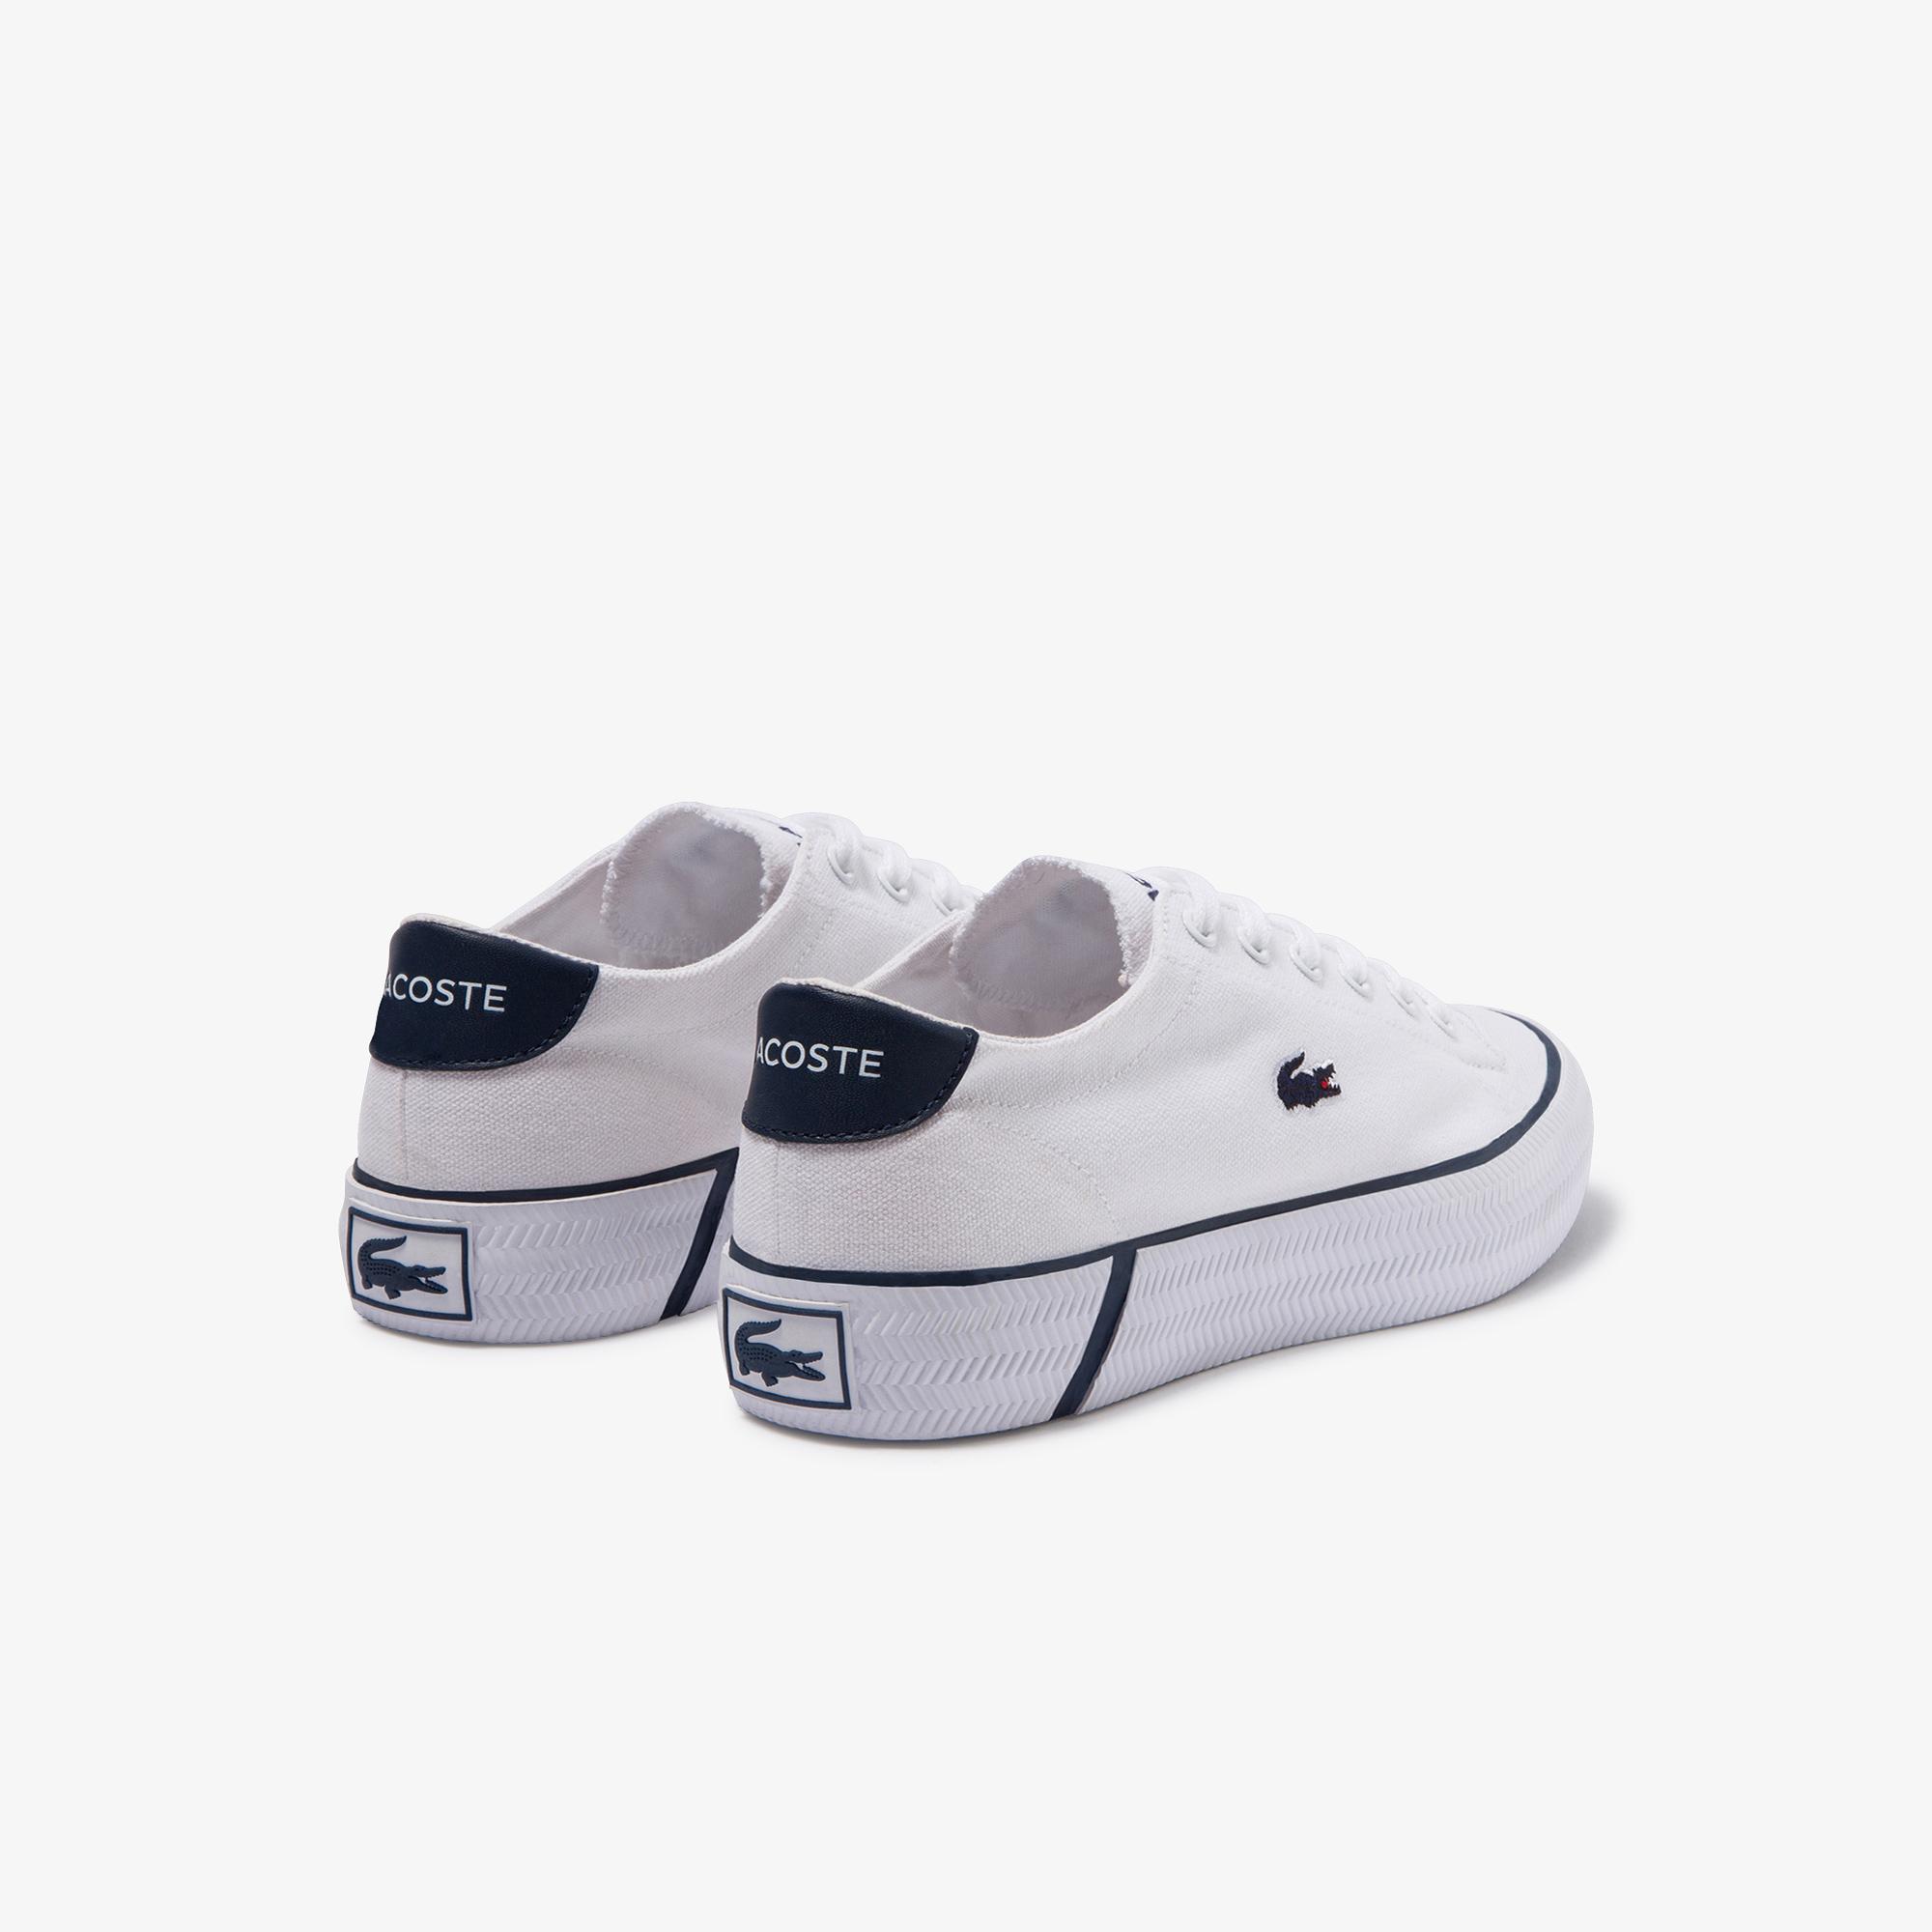 Lacoste Women's Gripshot 120 2 Cfa Leather Sneakers